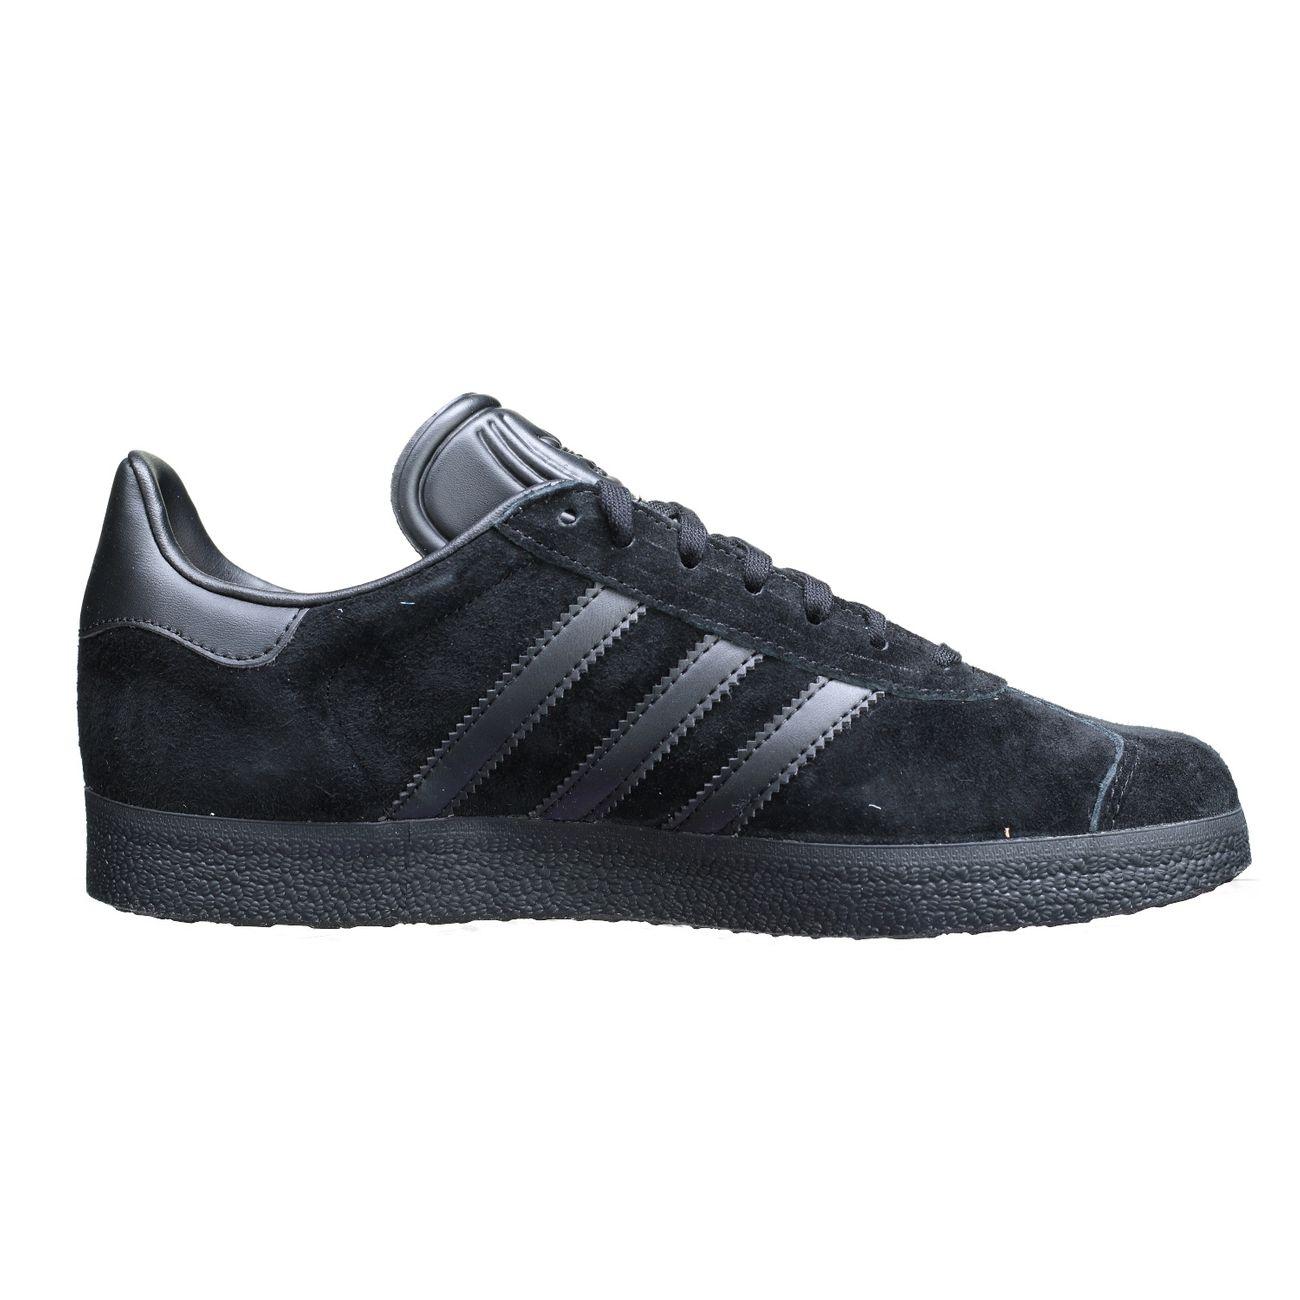 Mode Lifestyle homme ADIDAS ORIGINALS Basket adidas Originals Gazelle Core Black CQ2809